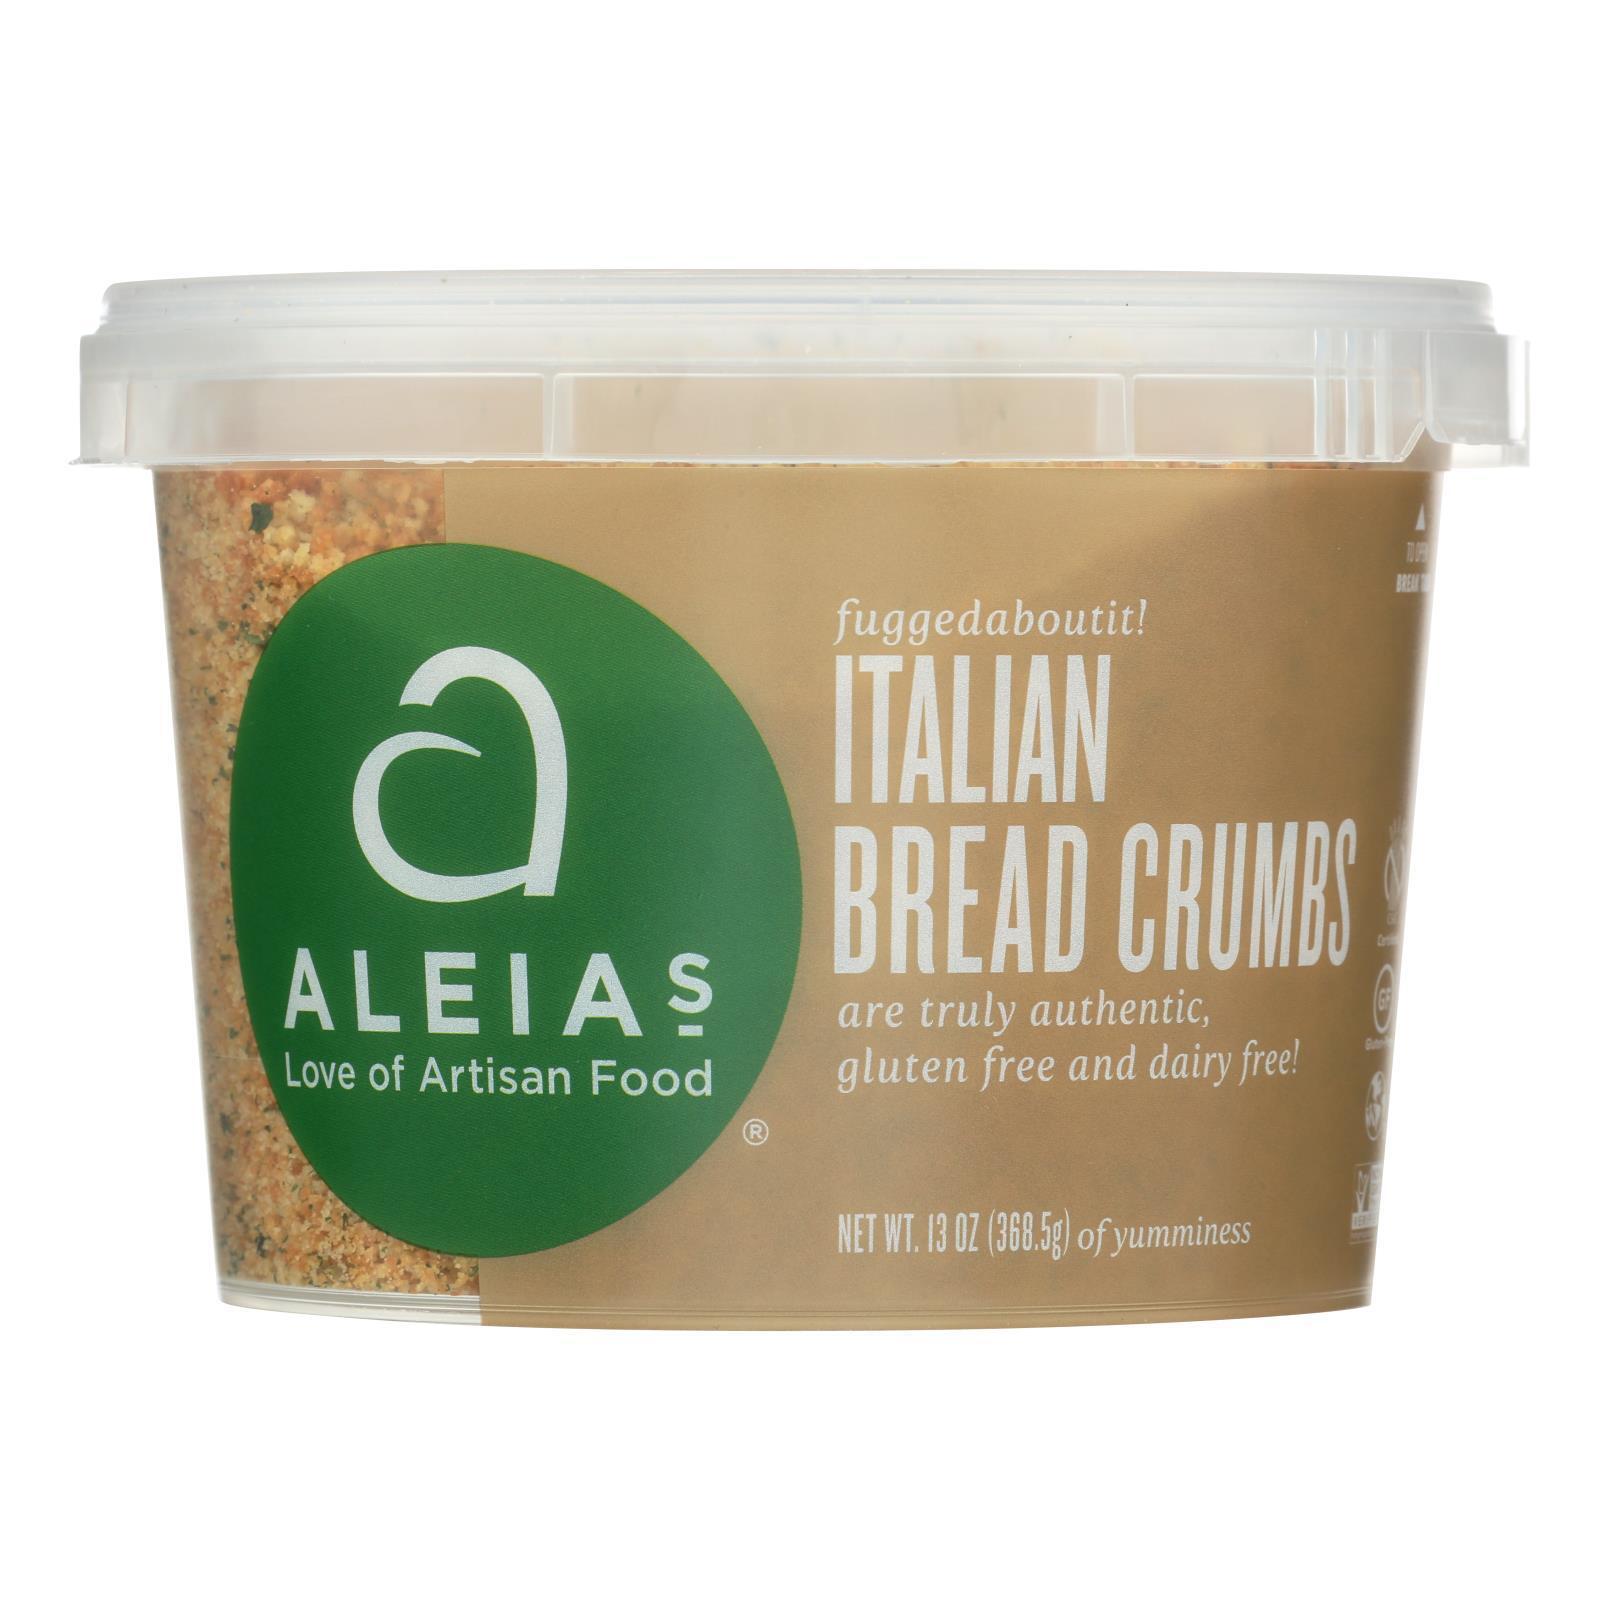 Aleia's Gluten Free Bread Crumbs - Italian - Case of 12 - 13 oz.